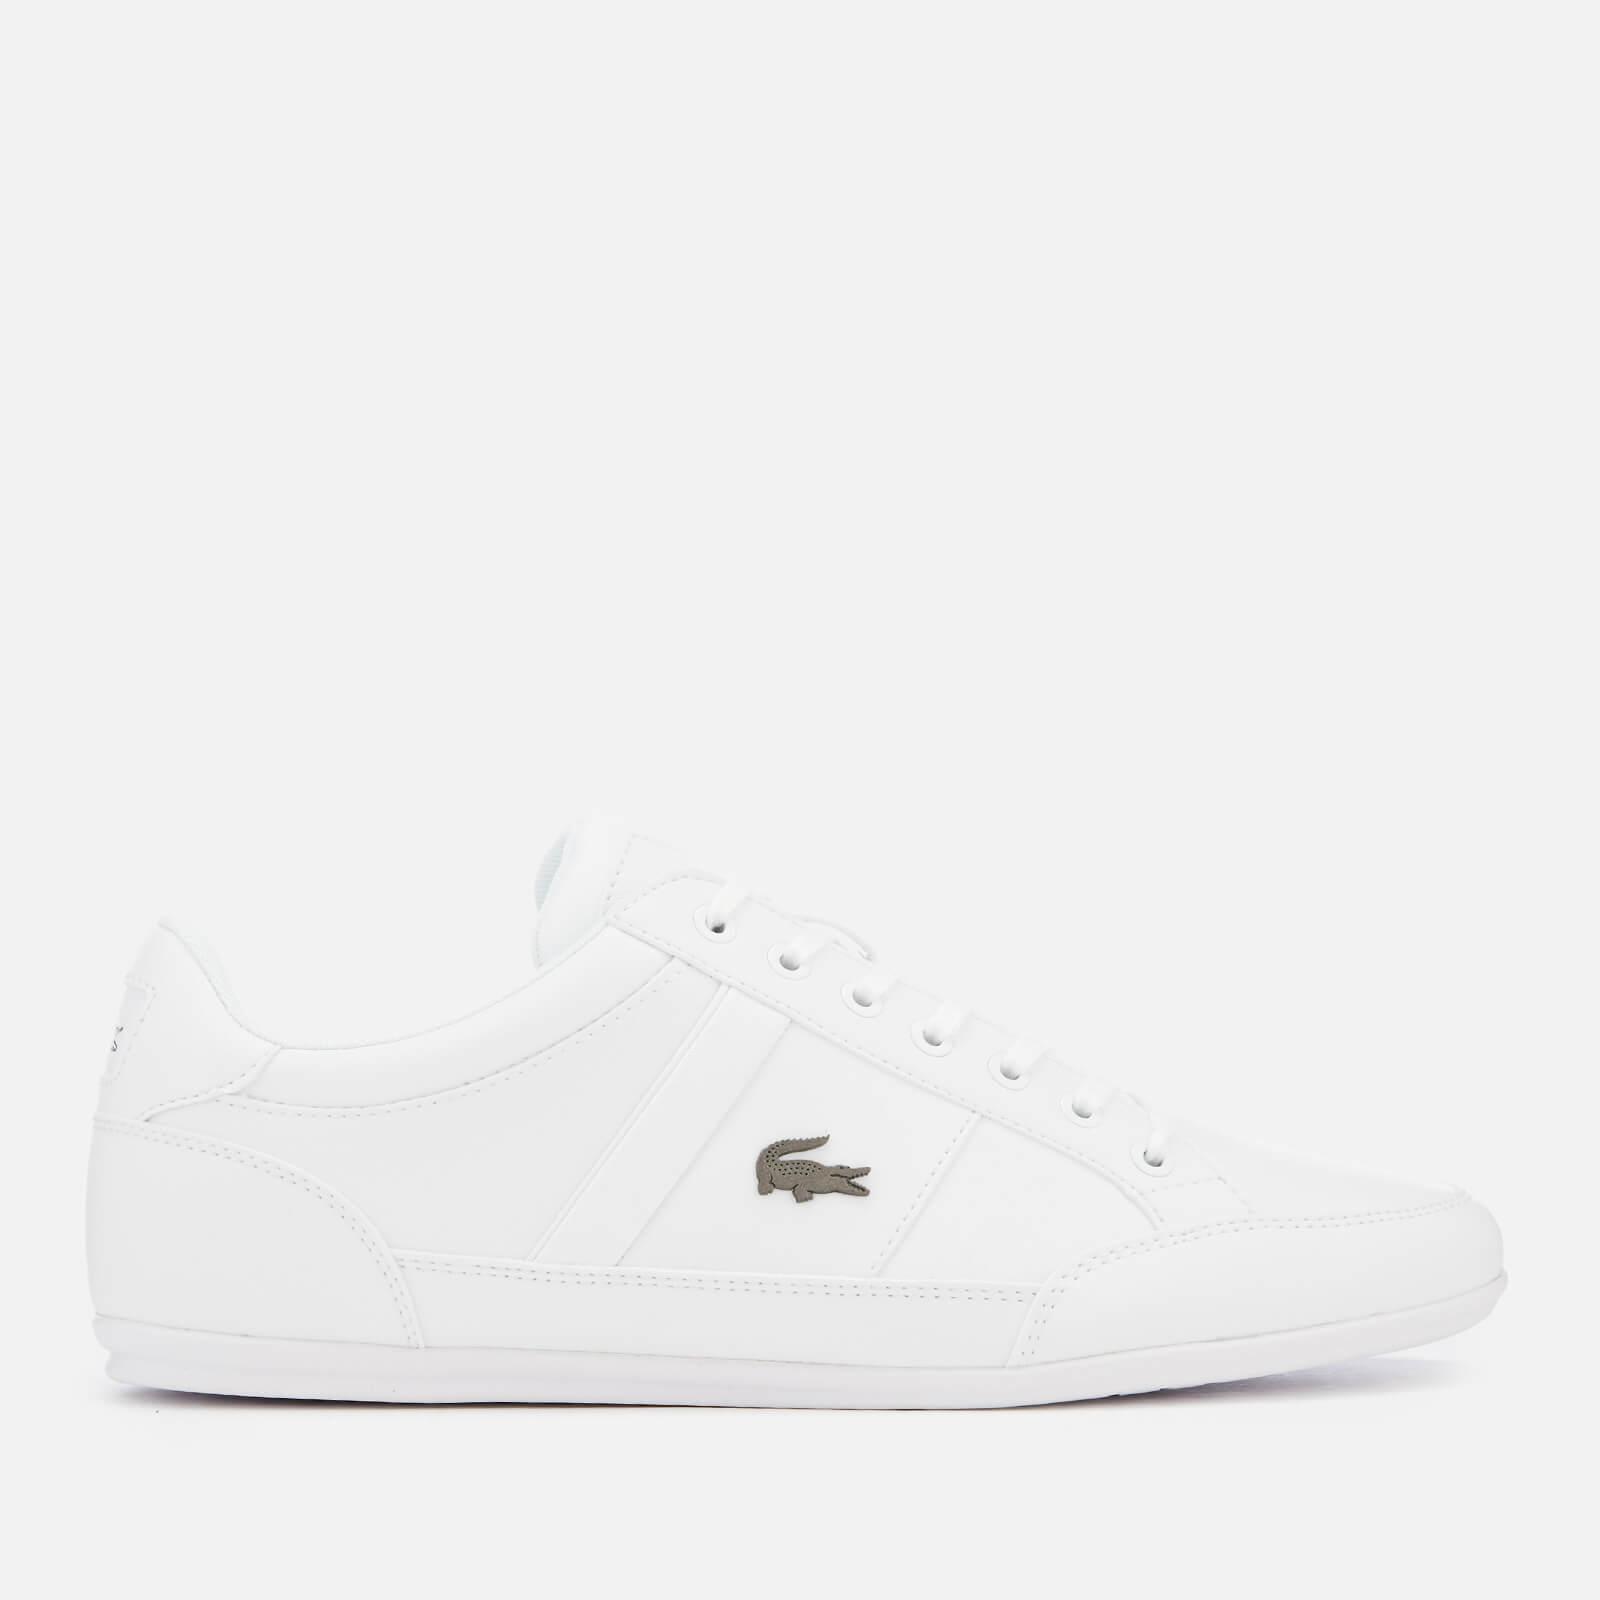 Lacoste Men's Chaymon Bl 1 Leather Low Profile Trainers - White/White - UK 8